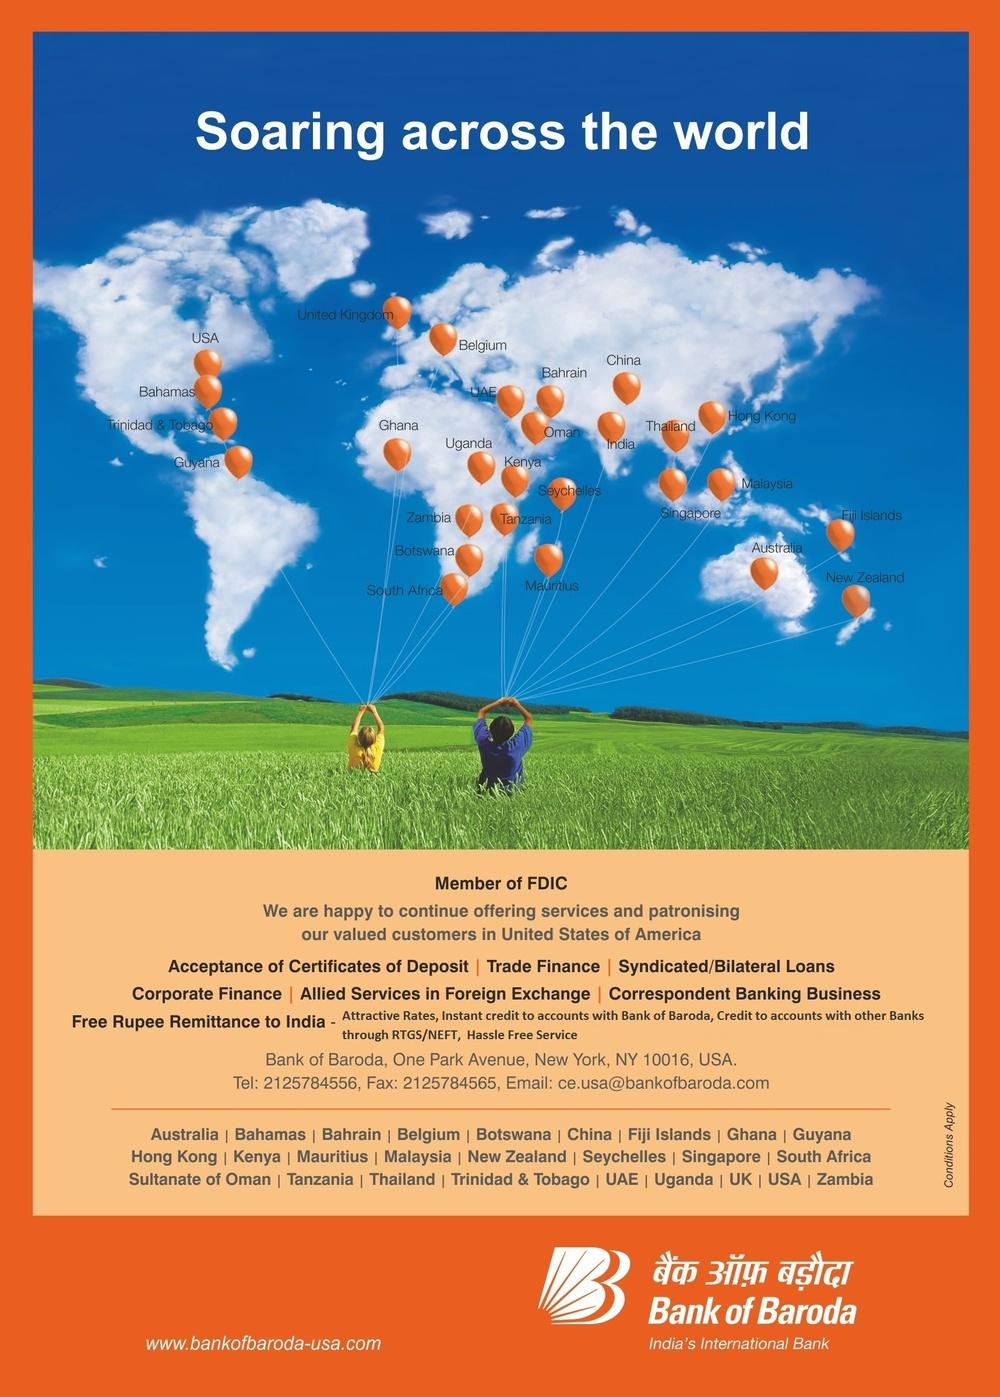 BankofBaroda_InternationalHindiConference.jpg